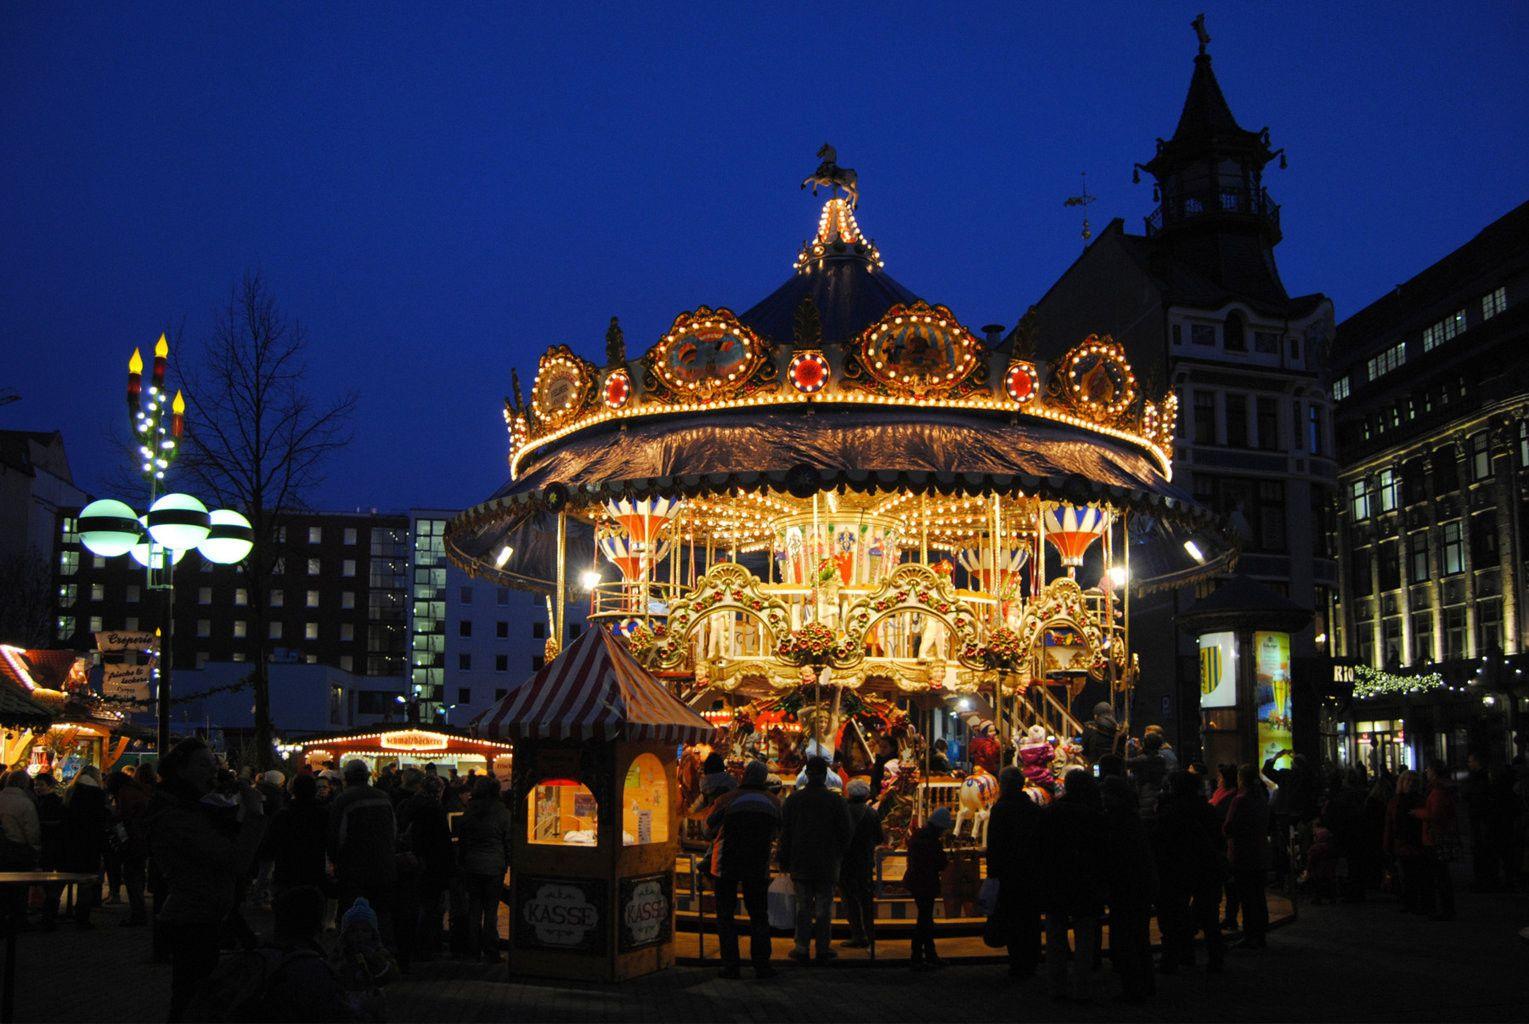 Leipzig Christmas Market - Copyright Andreas Schmidt. All the best Christmas Markets are on @ebdestinations #Christmas #xmas #travel #Europe #Leipzig